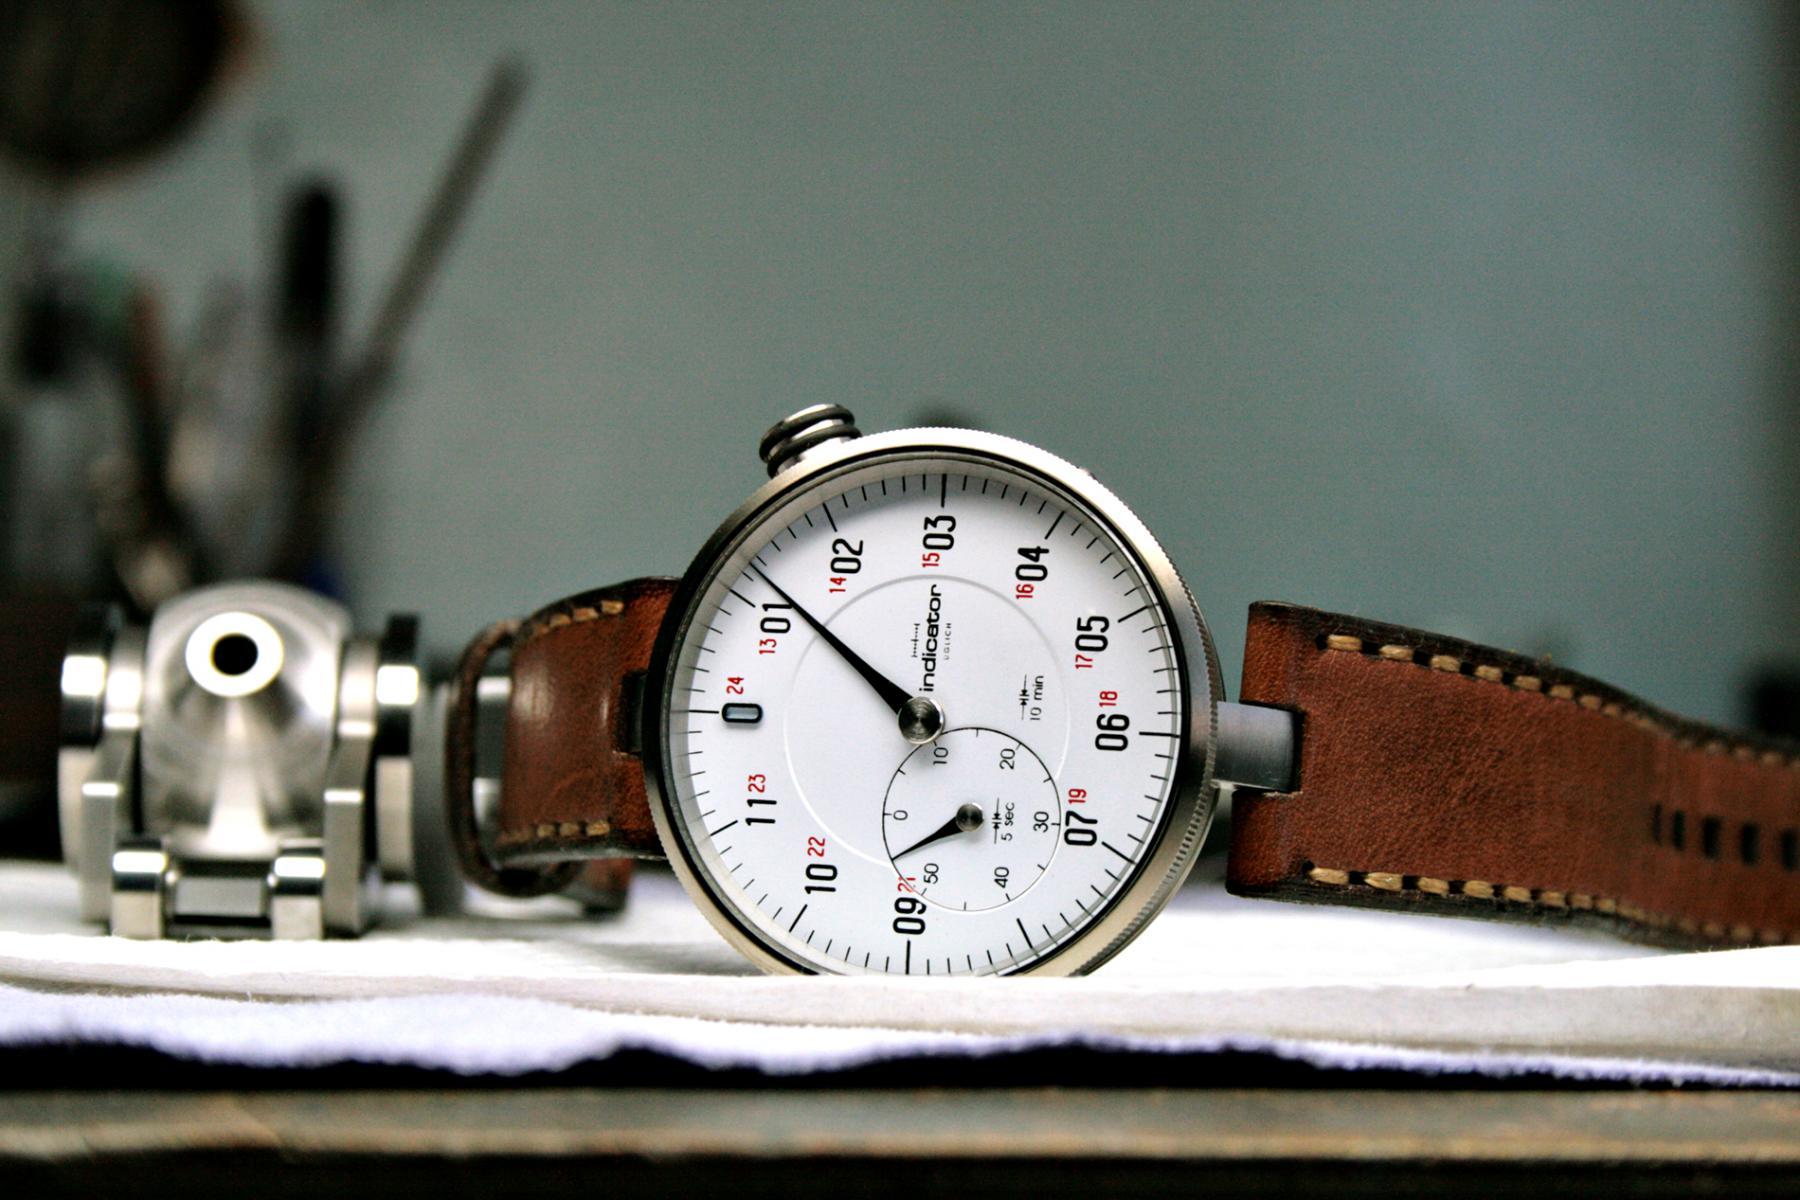 New RUSSIAN time tool INDICATOR-img_7507.jpg